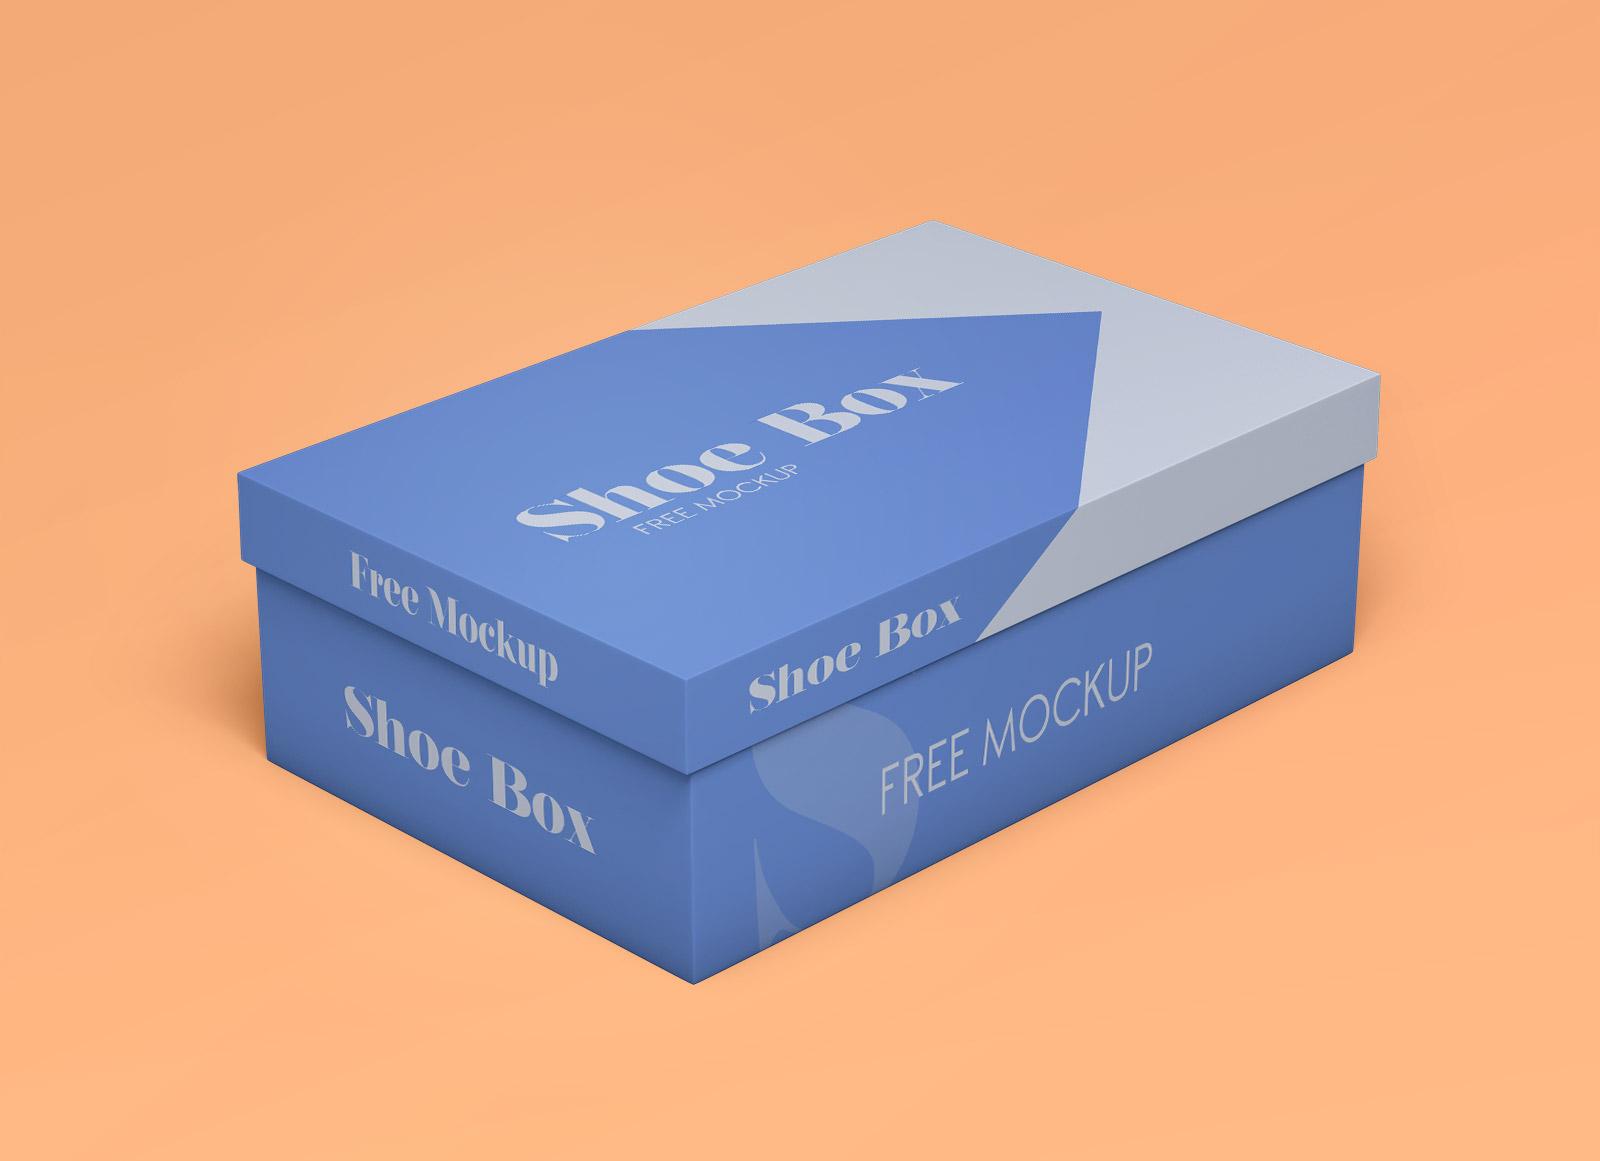 Free-Shoe-Box-Packaging-Mockup-PSD-Set